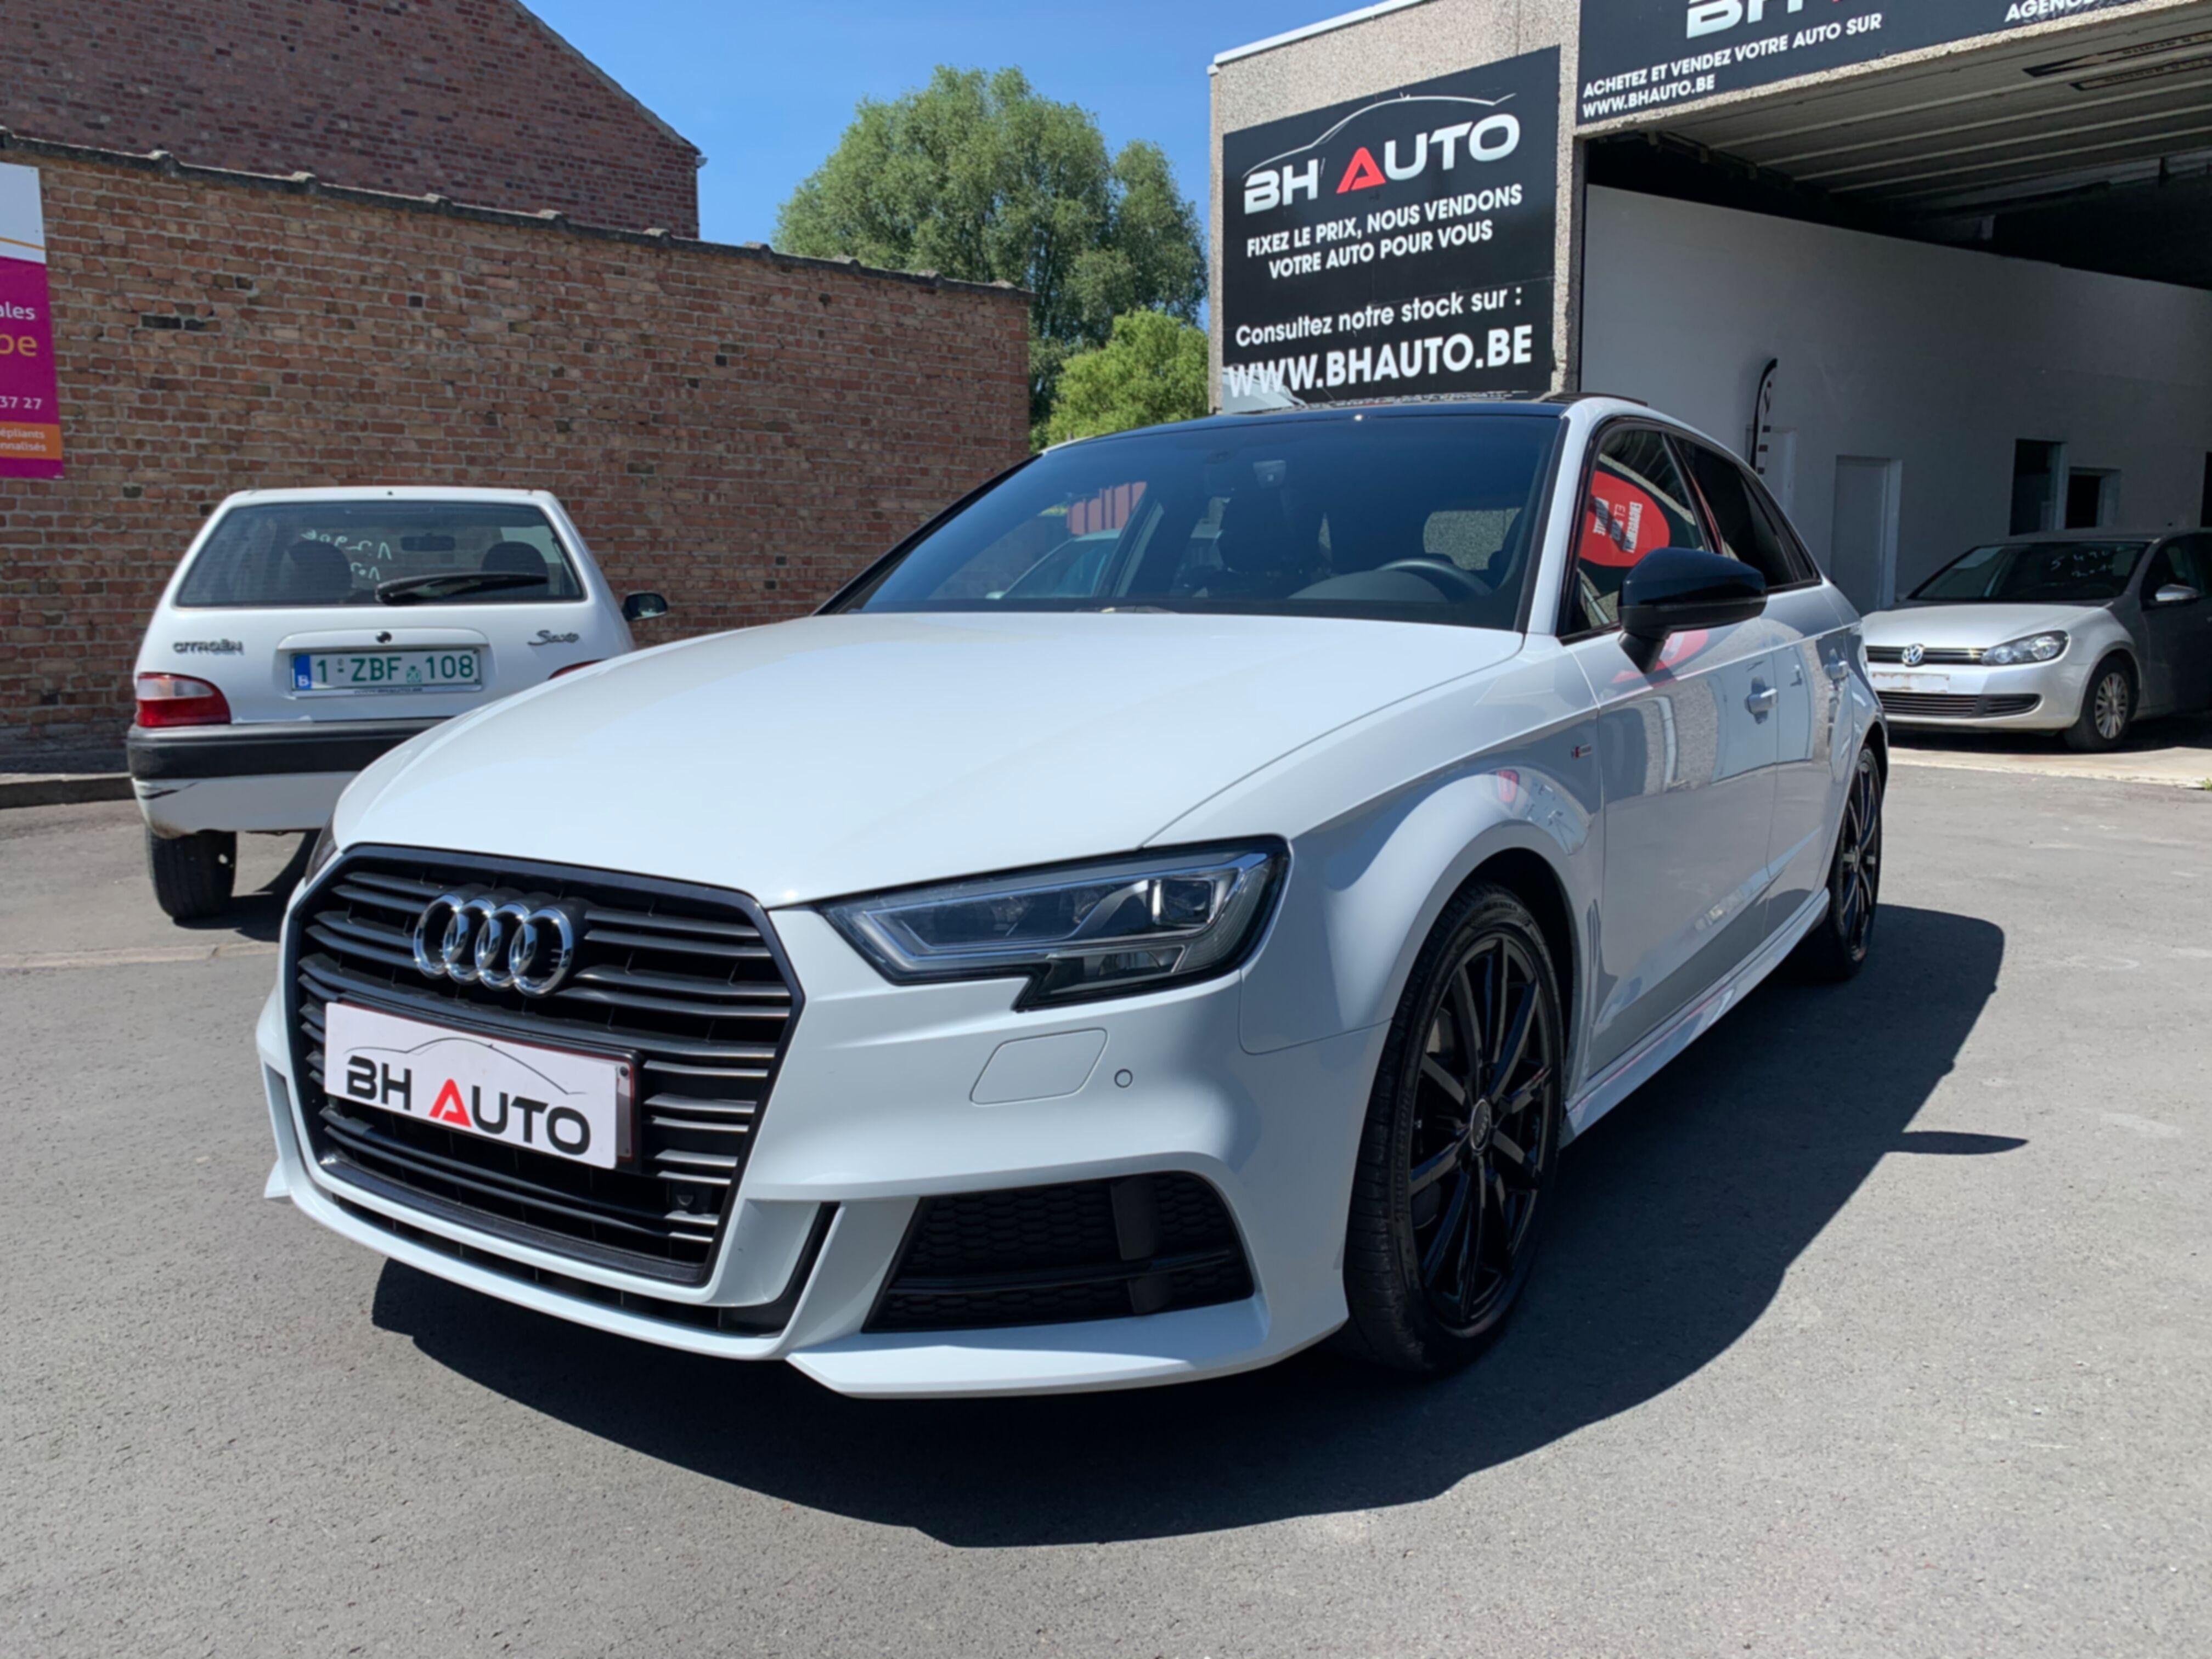 Audi A3 Sportback 1.0 TSI Sline